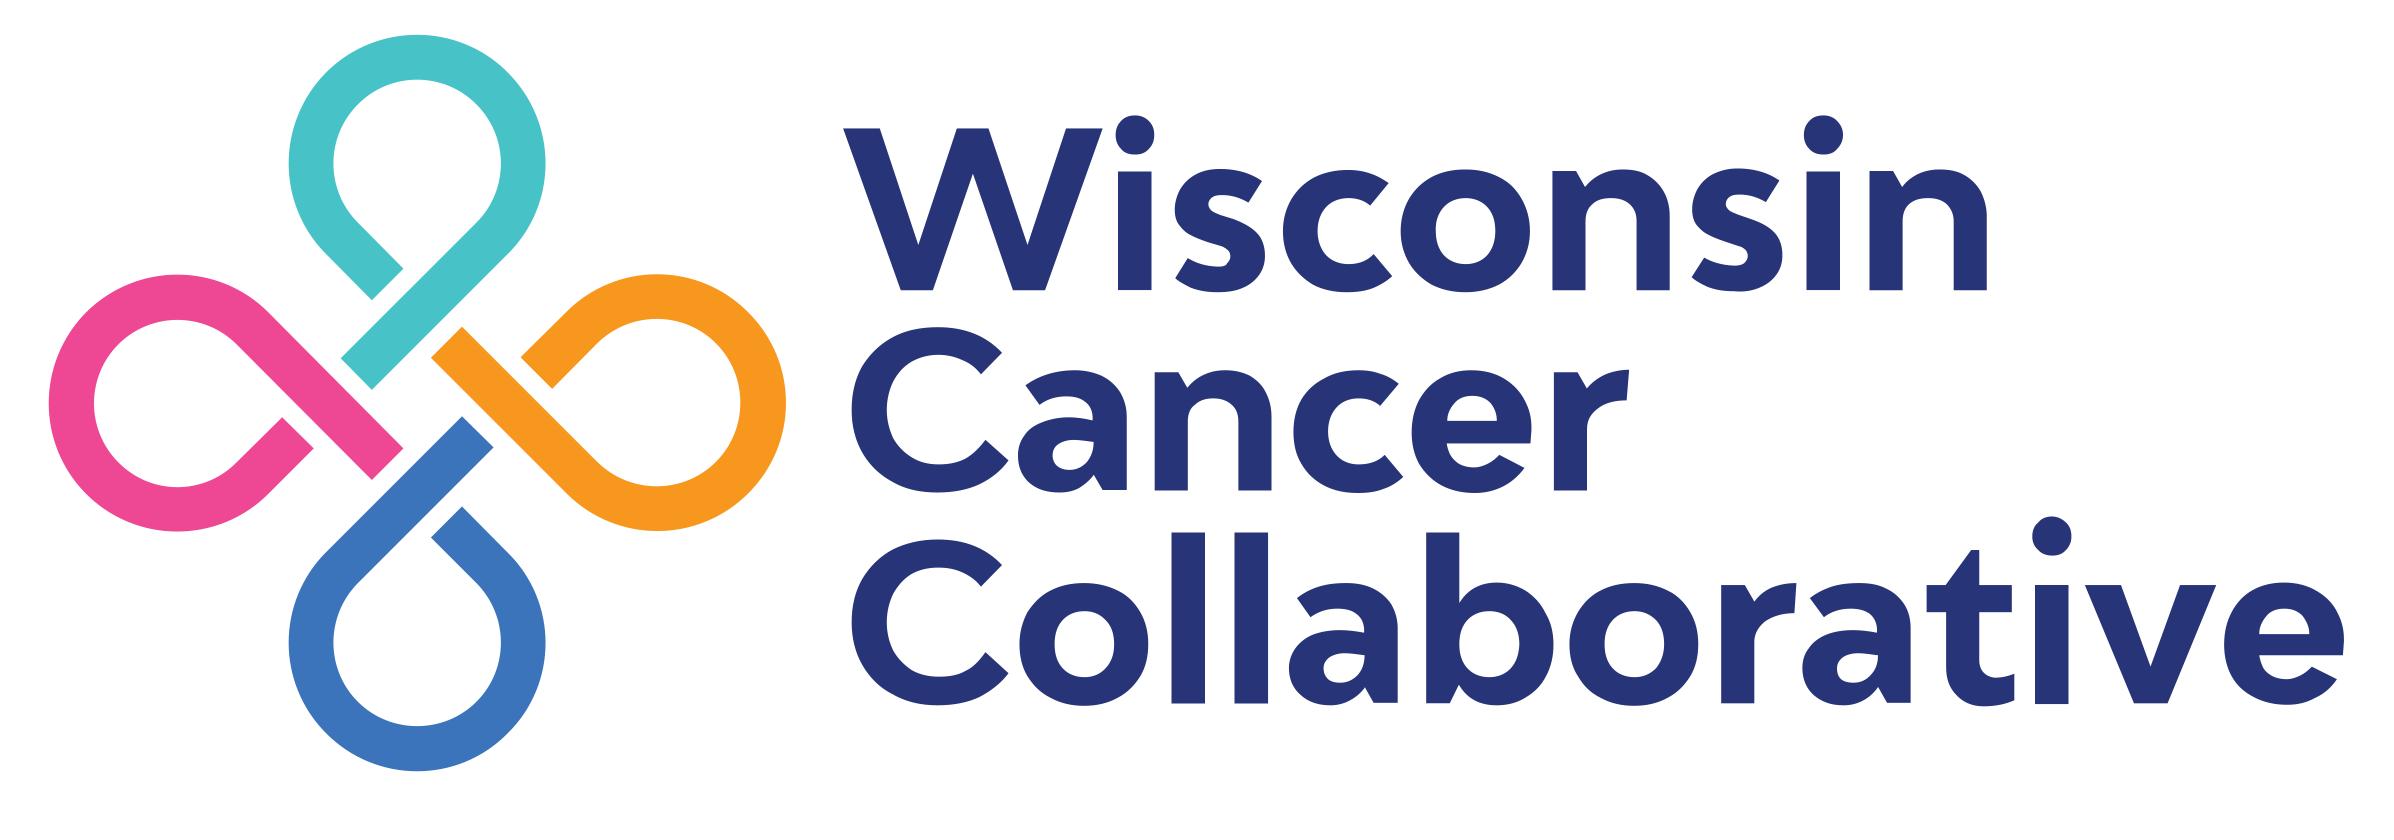 Wisconsin Cancer Collaborative Logo